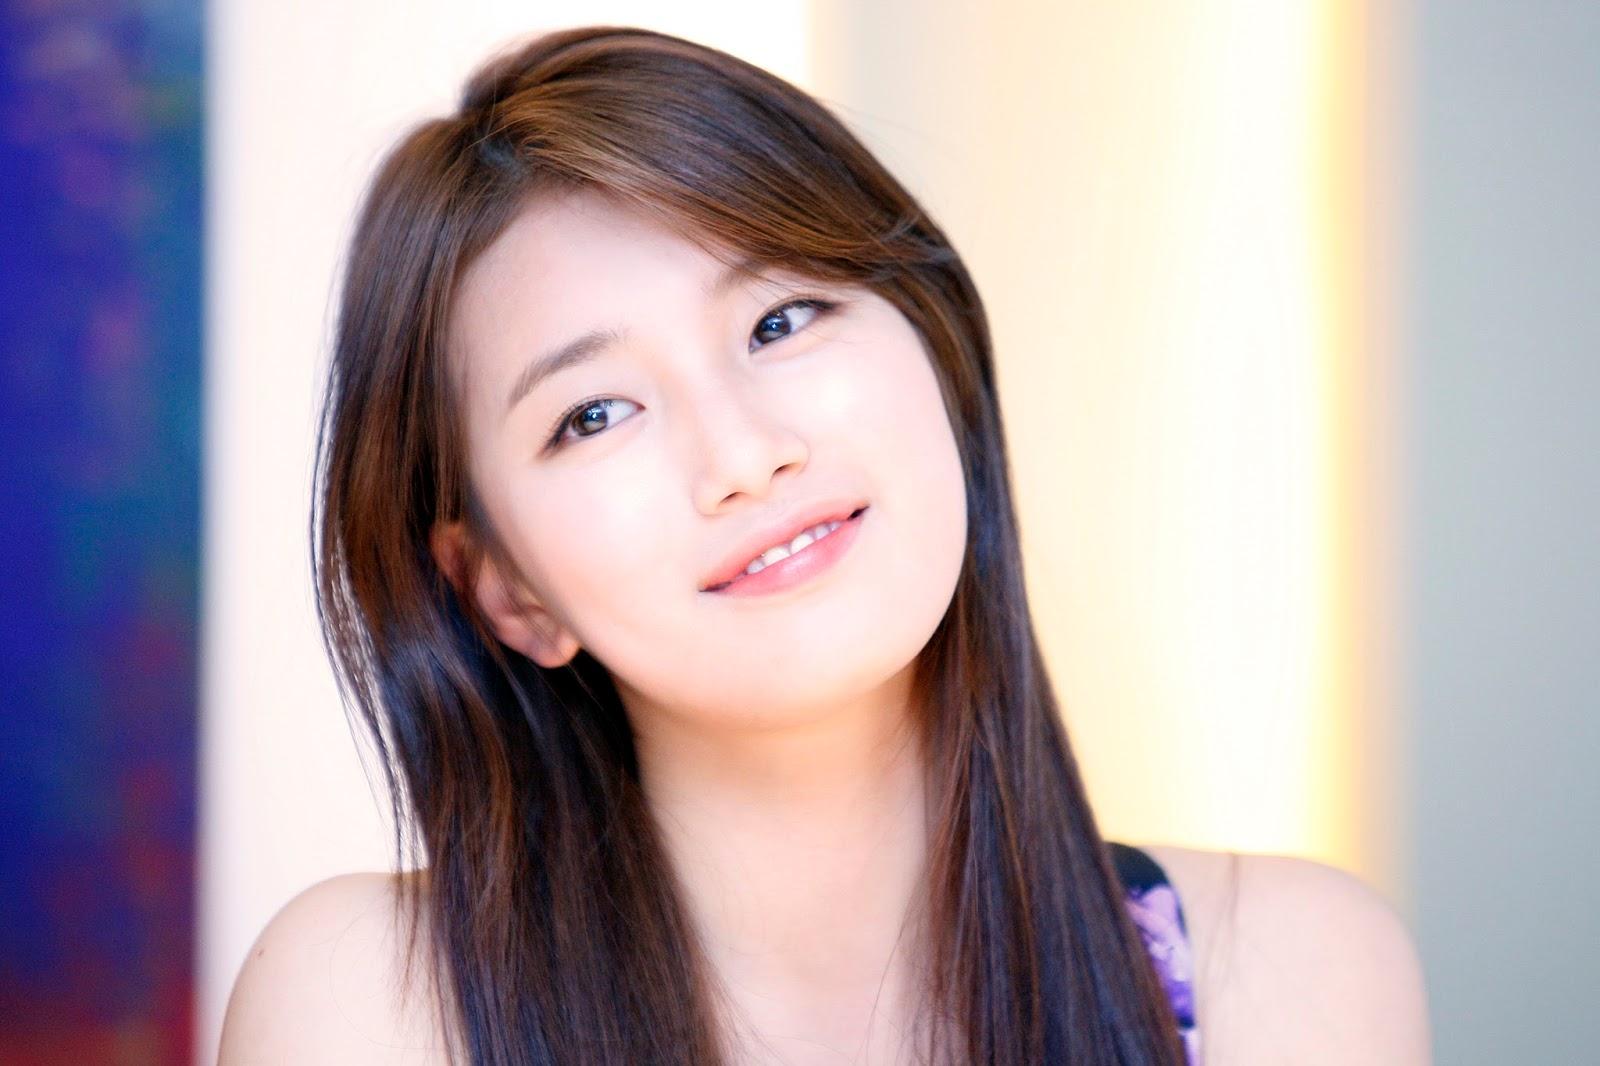 Brixzen Intip Tren Gaya Rambut Wanita 2016 Ala Korea Yang Hits Abis